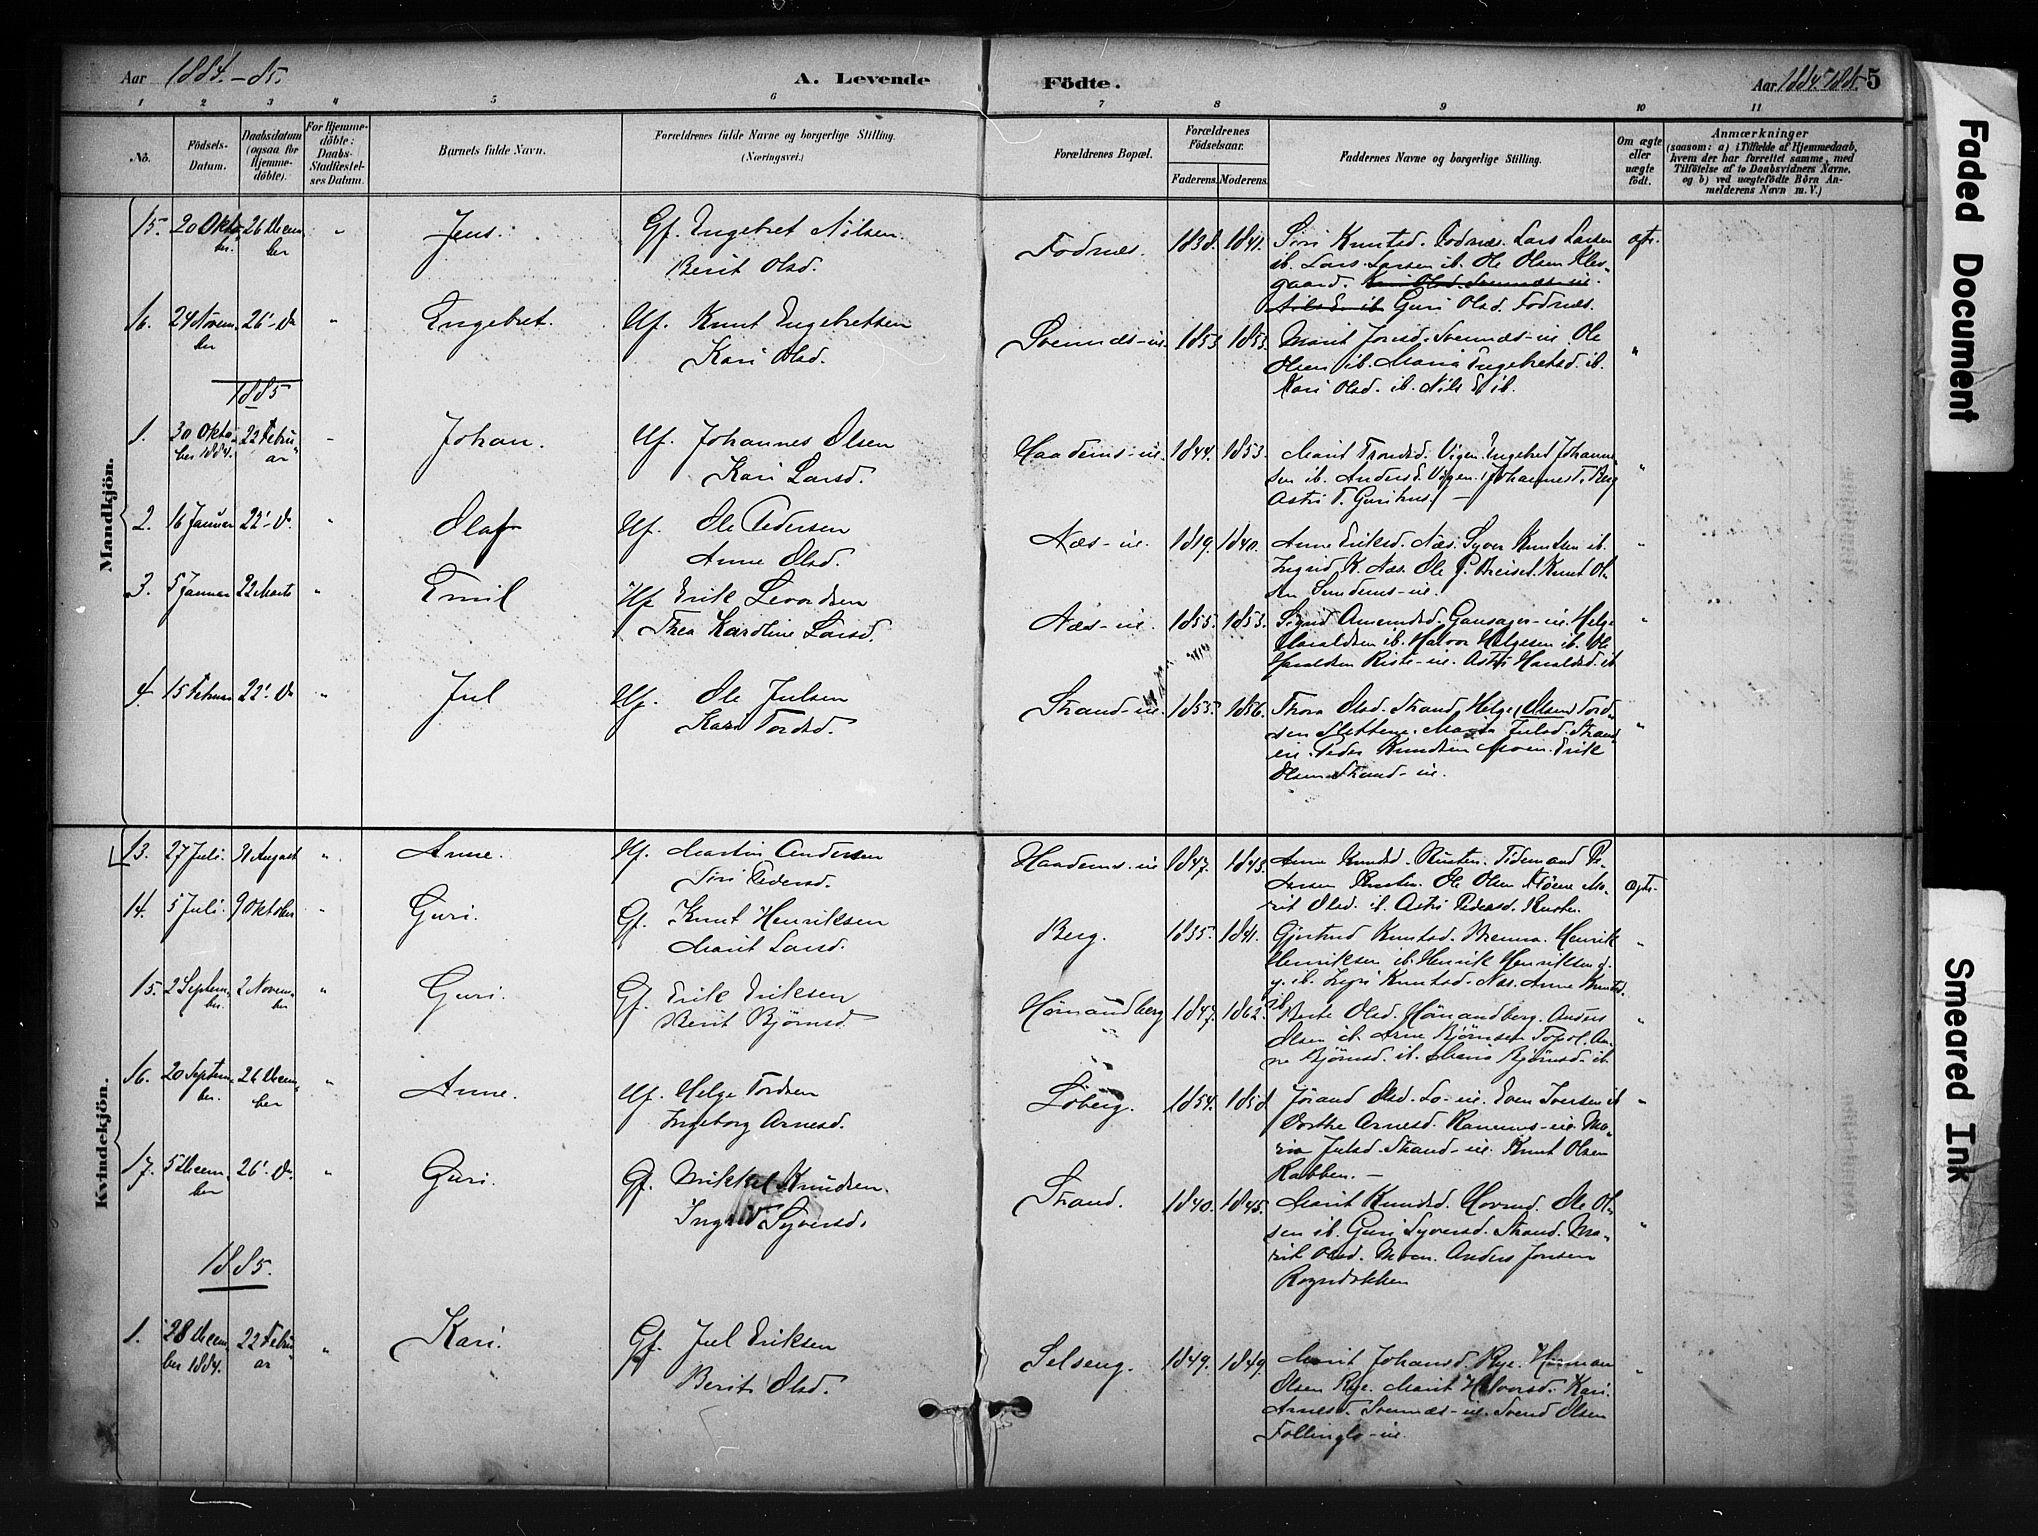 SAH, Nord-Aurdal prestekontor, Ministerialbok nr. 10, 1883-1896, s. 5